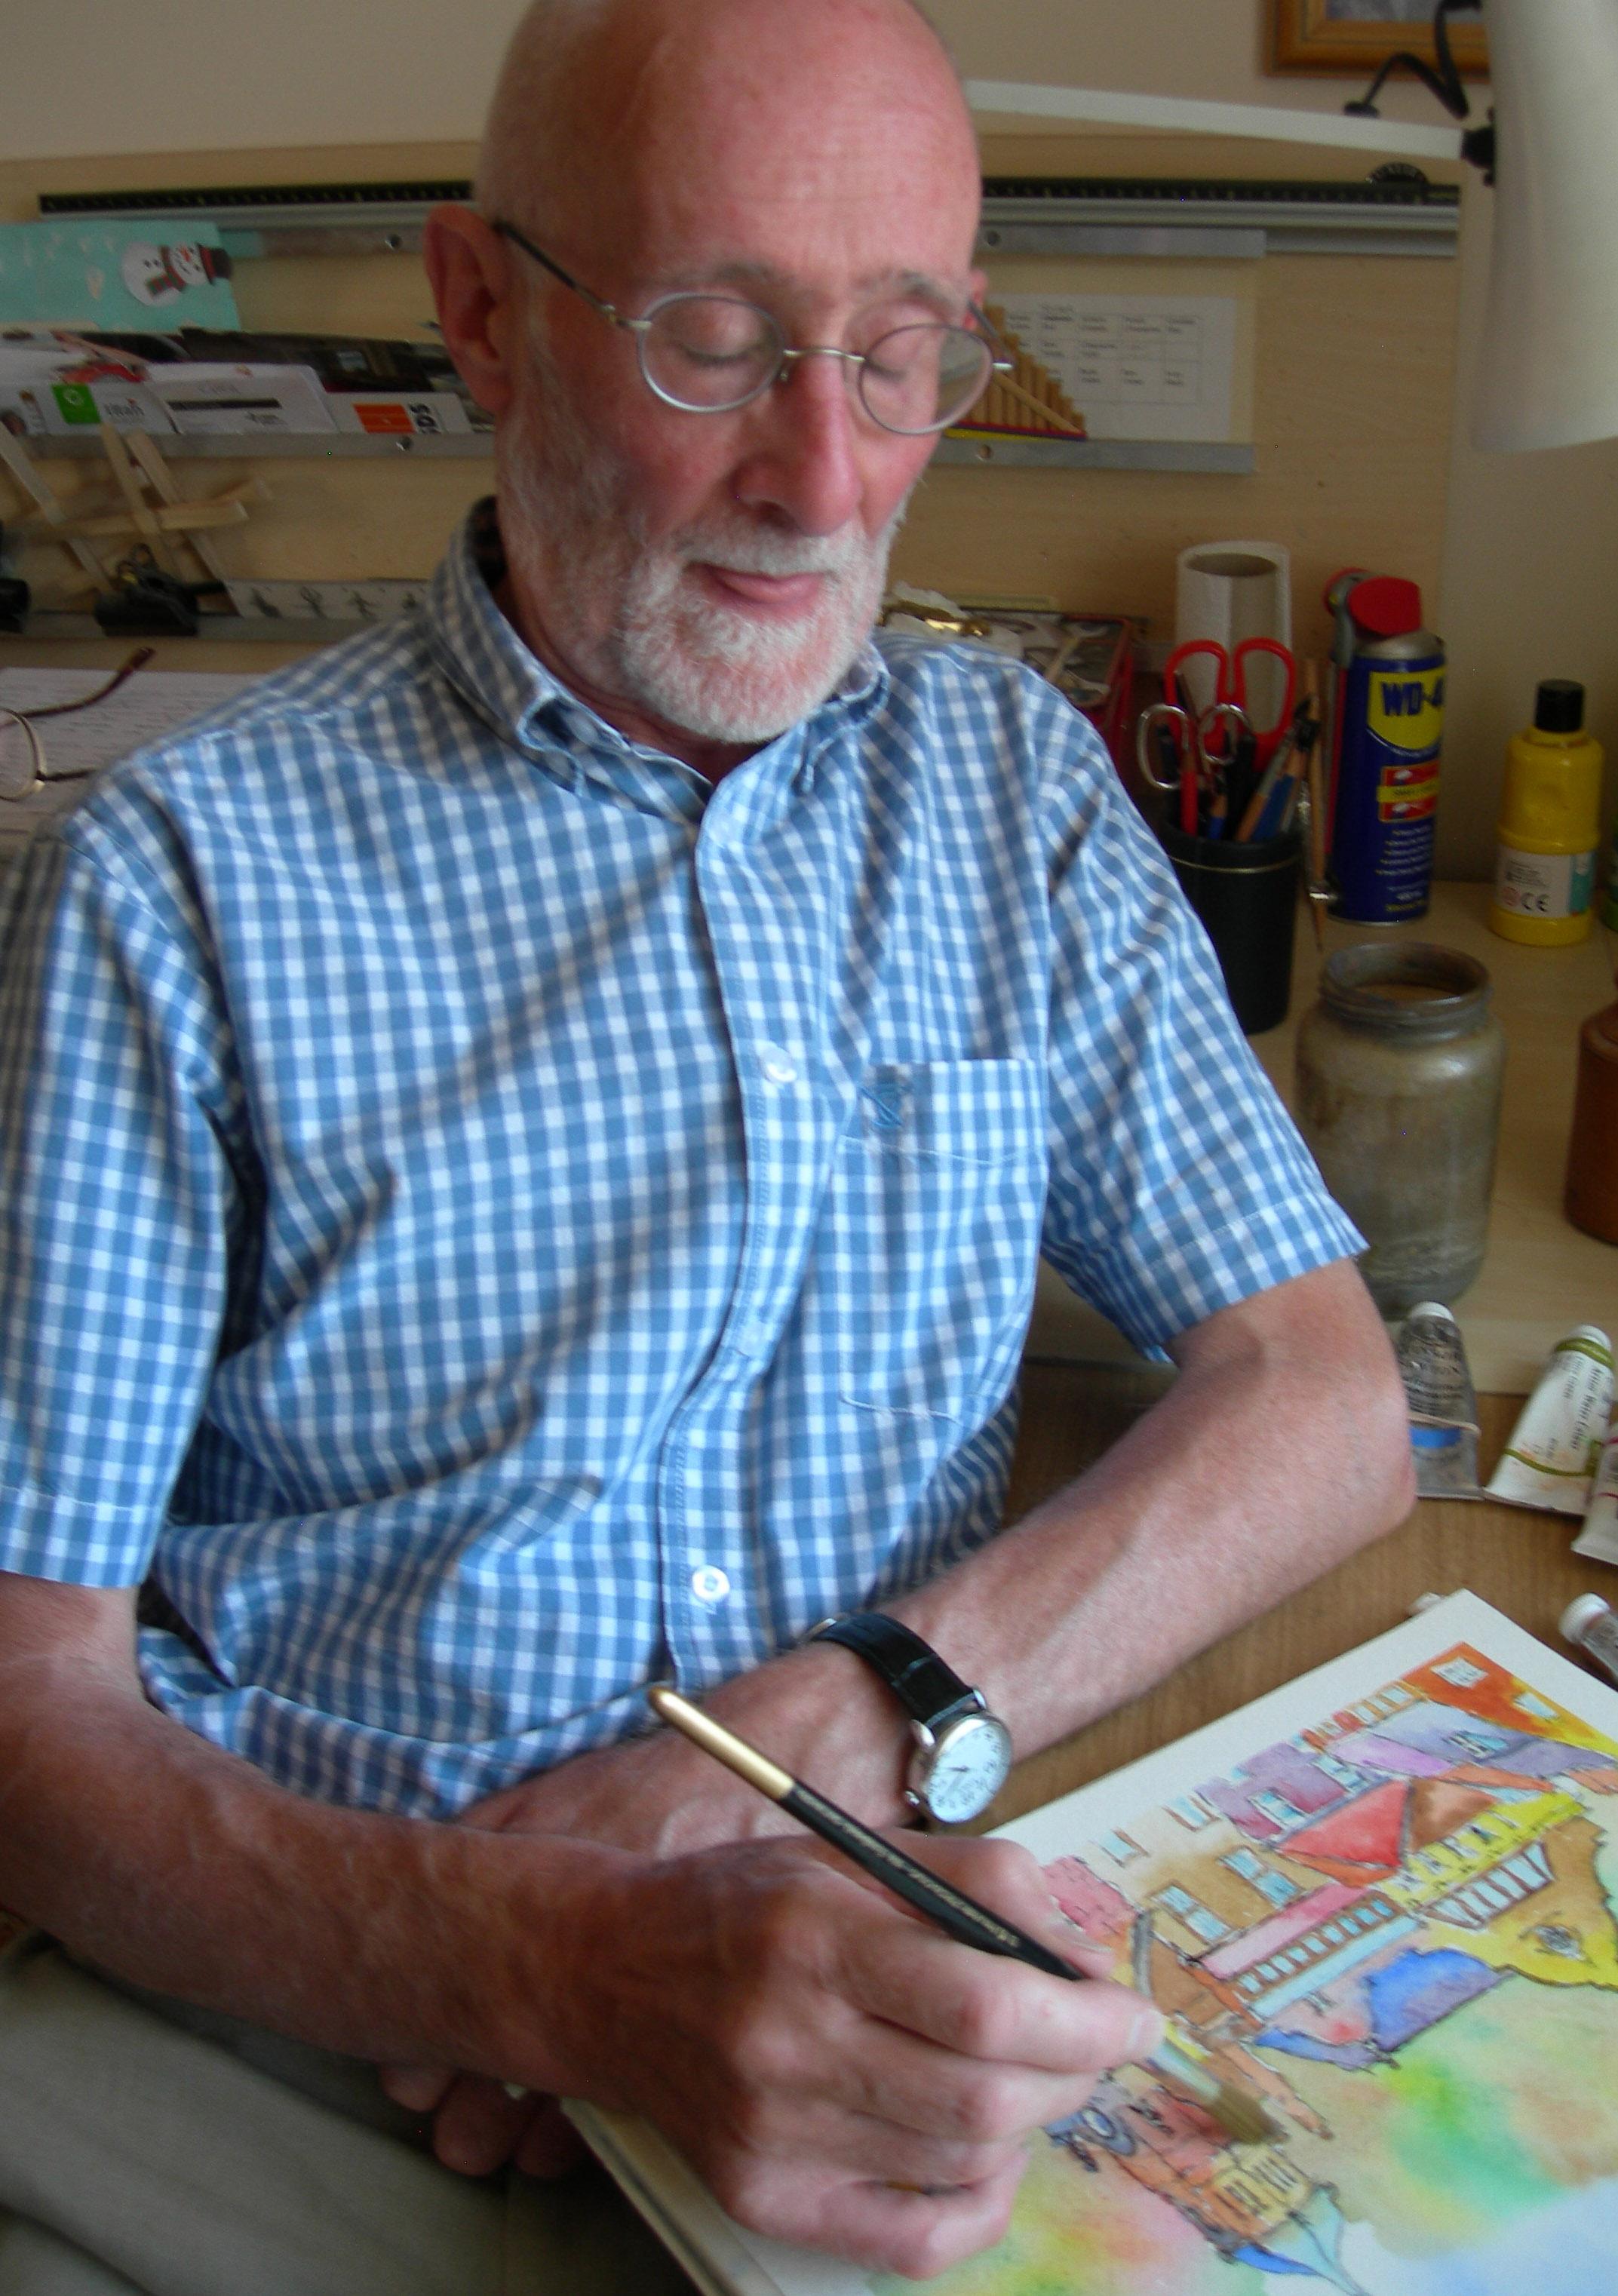 Allan Clifford - made in bradford on avon website - self portrait.jpg